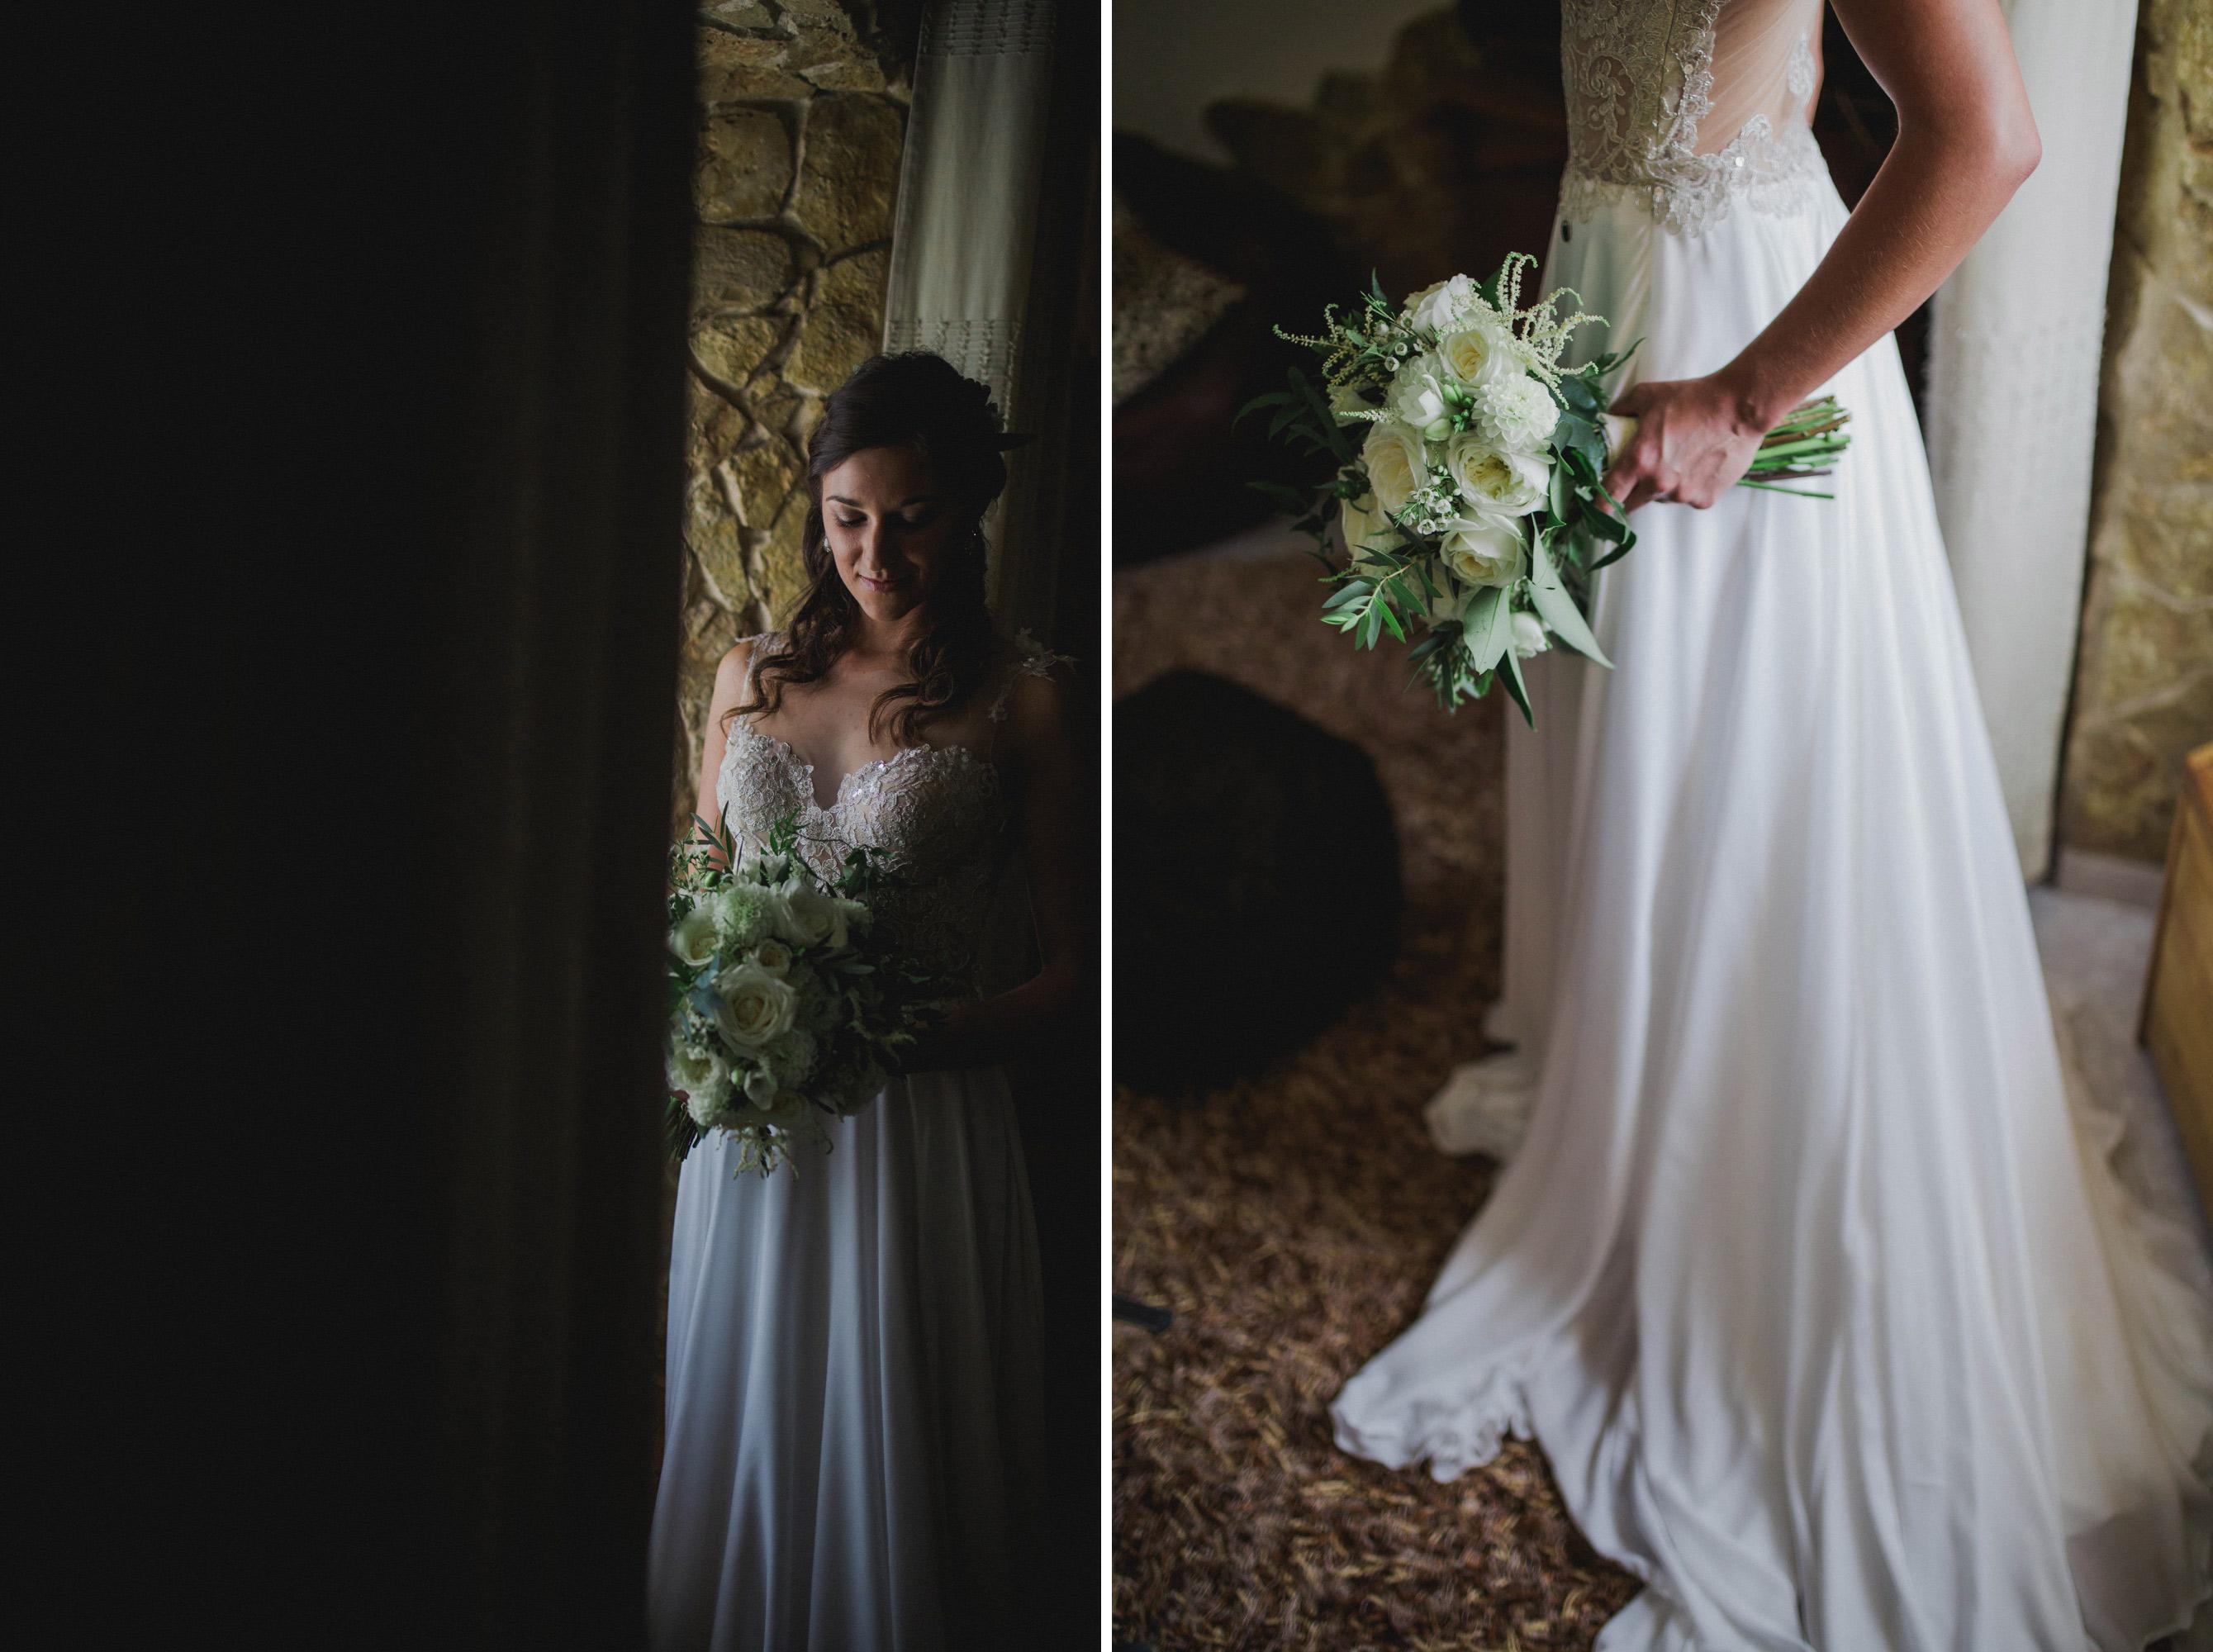 073-carina-e-samuel-wedding-casamento-quinta-dos-rouxinois-rustico-my-fancy-wedding-mafra-malveira-lisboa-sintra-cascais-filipe-santiago-fotografia-fotografo-lifestyle-destination-portugal